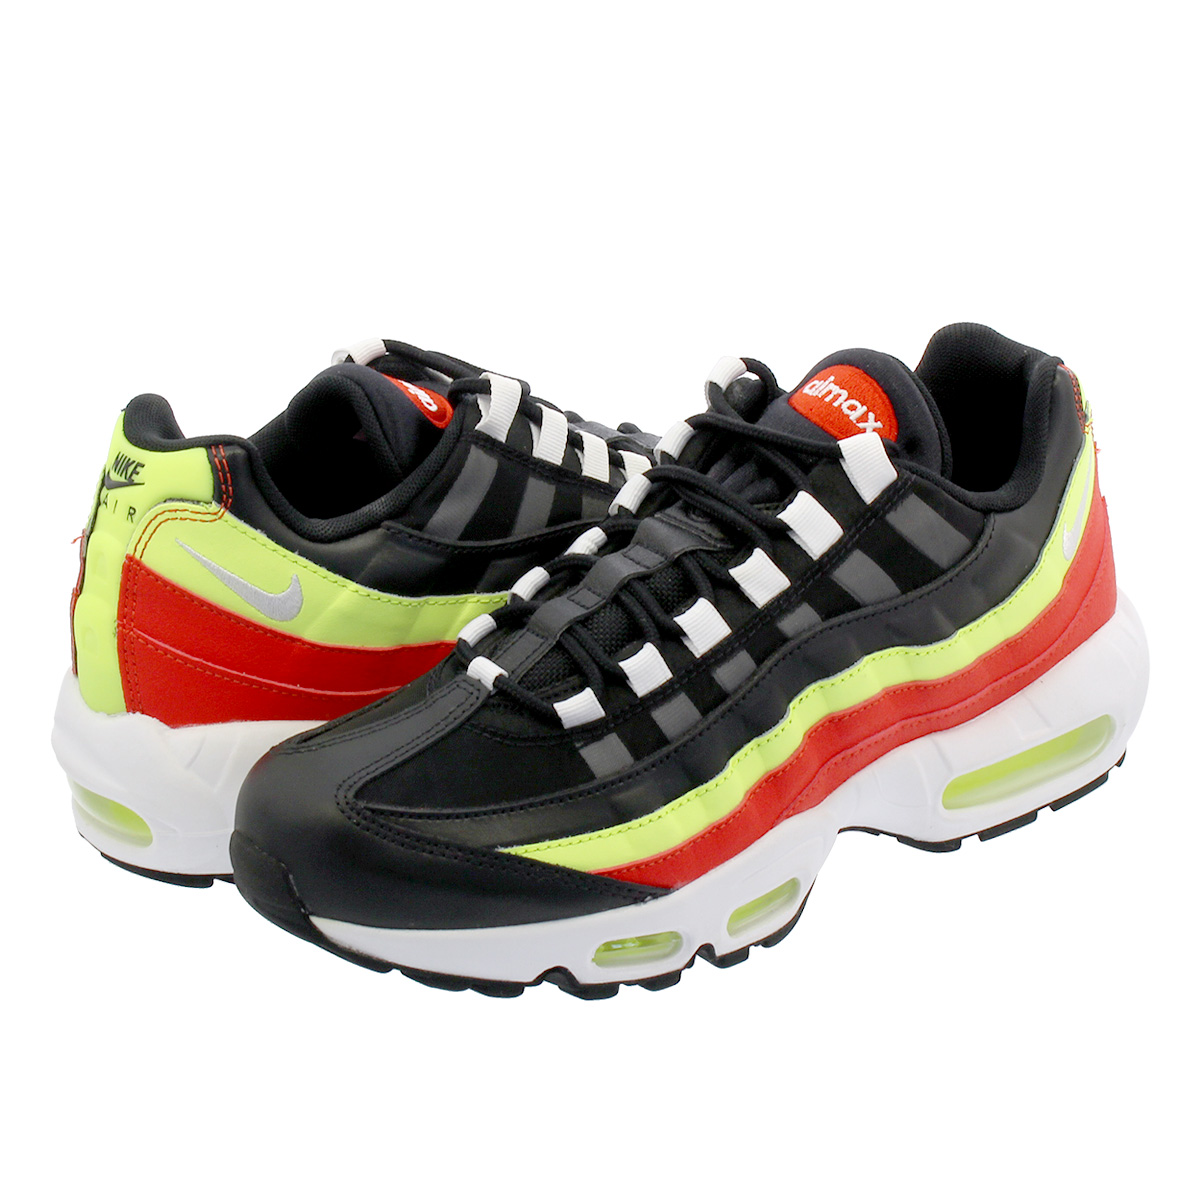 buy online d8c6f 7dd6f NIKE WMNS AIR MAX 95 Nike women Air Max 95 BLACK/WHITE/HABANERO RED/VOLT  307,960-019